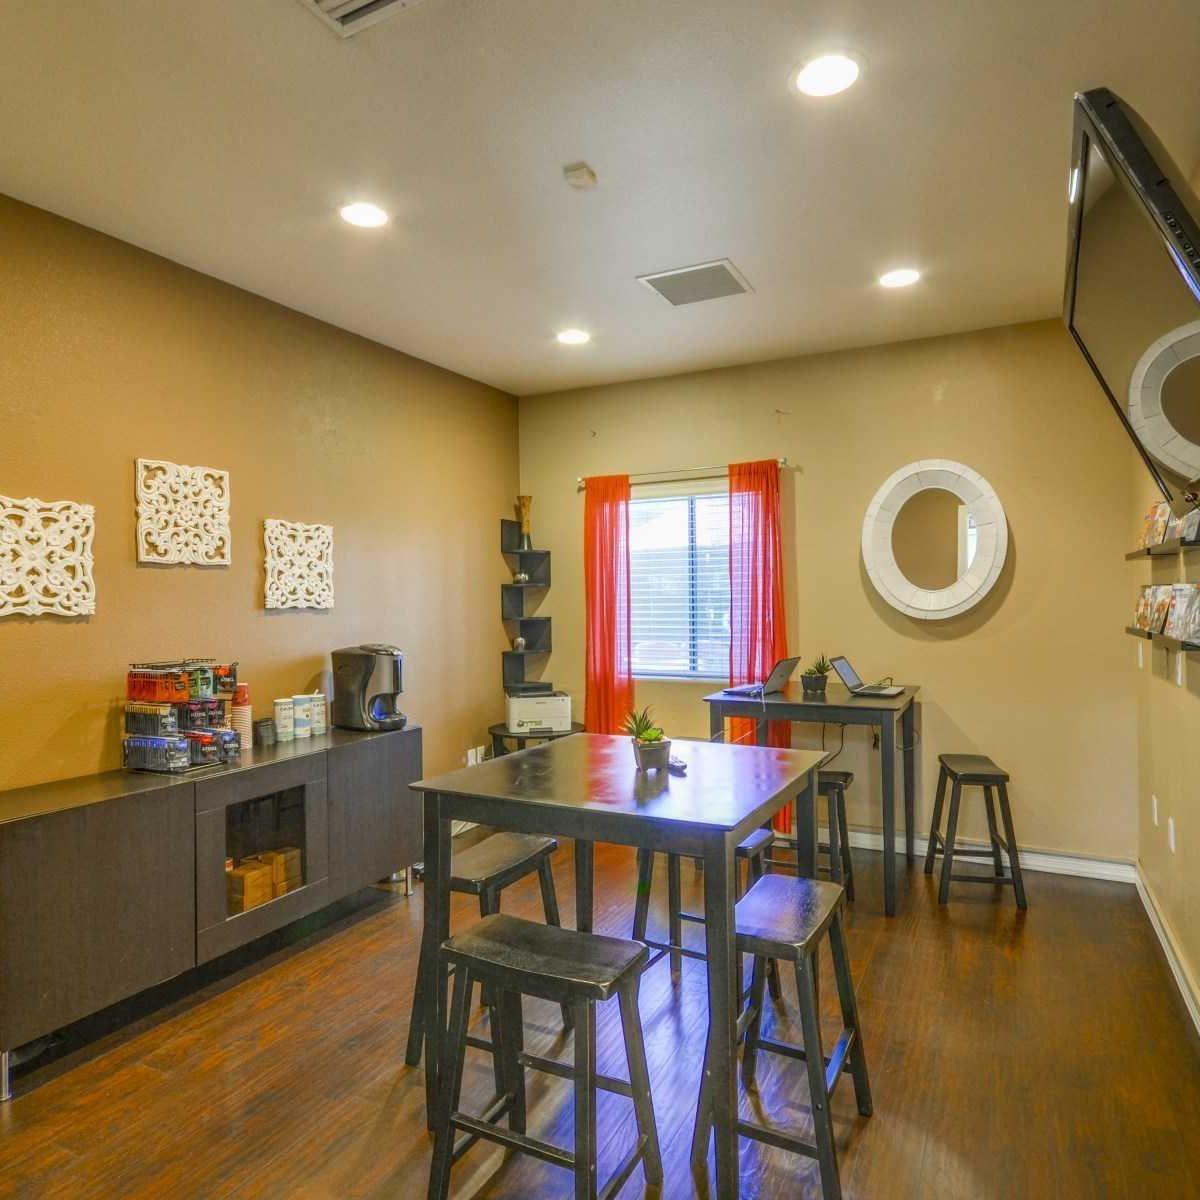 The Villas On Bell Apartments, Phoenix